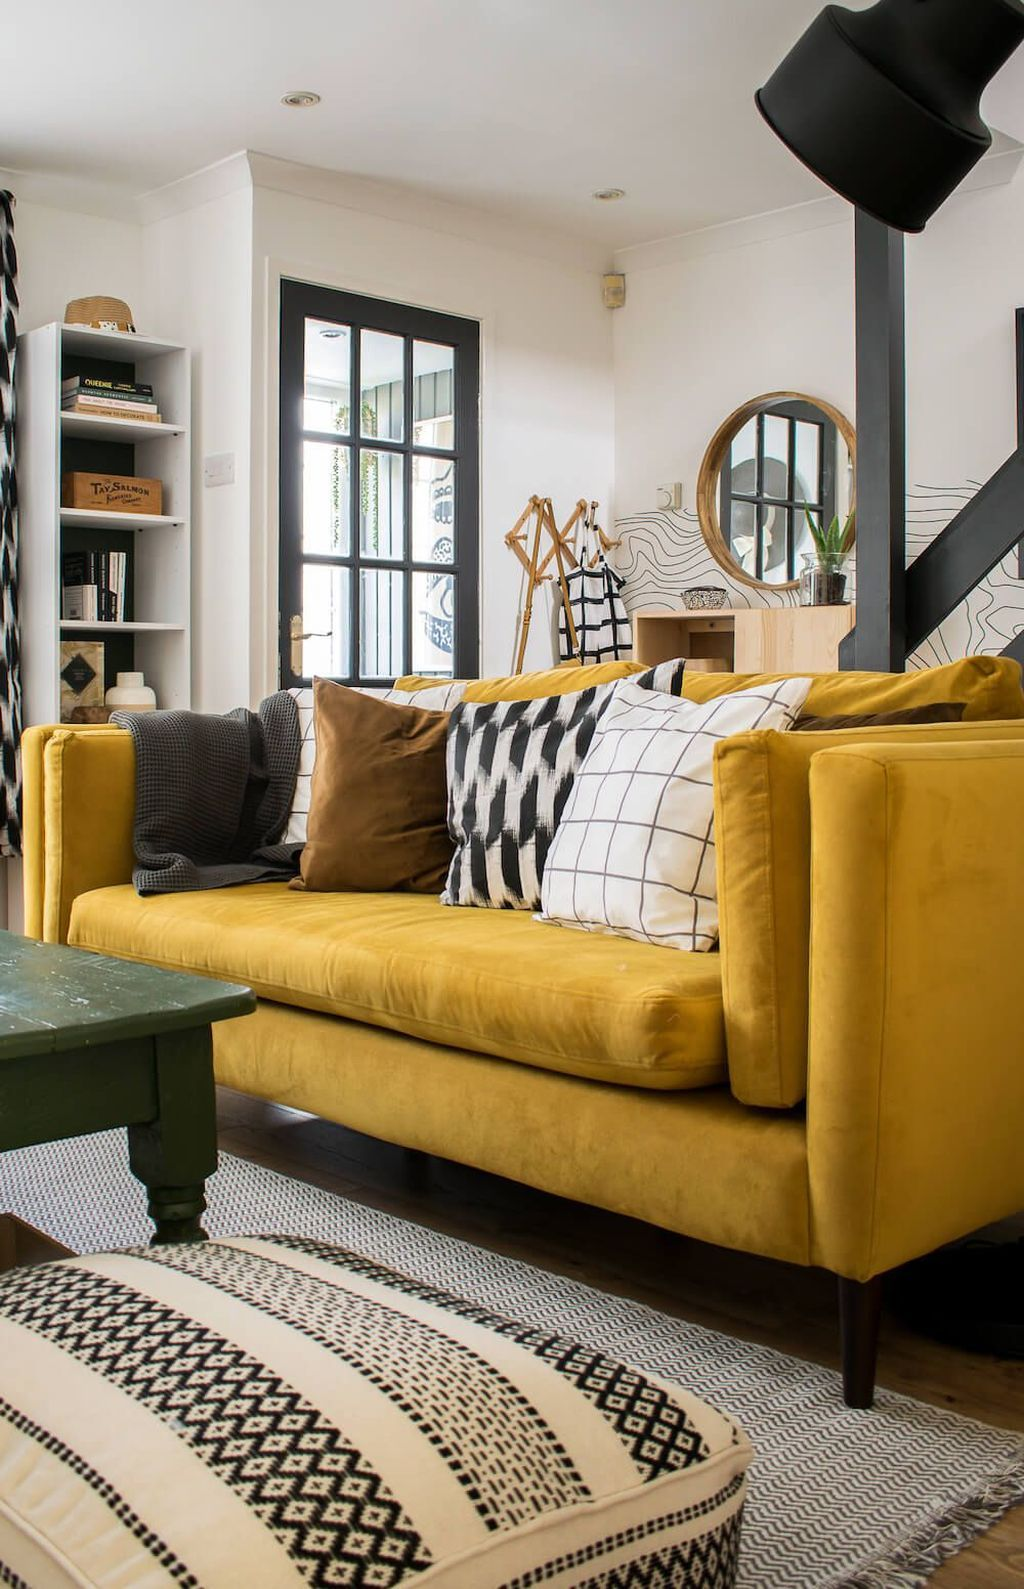 Pin On Living Room Decor #yellow #living #room #decor #ideas